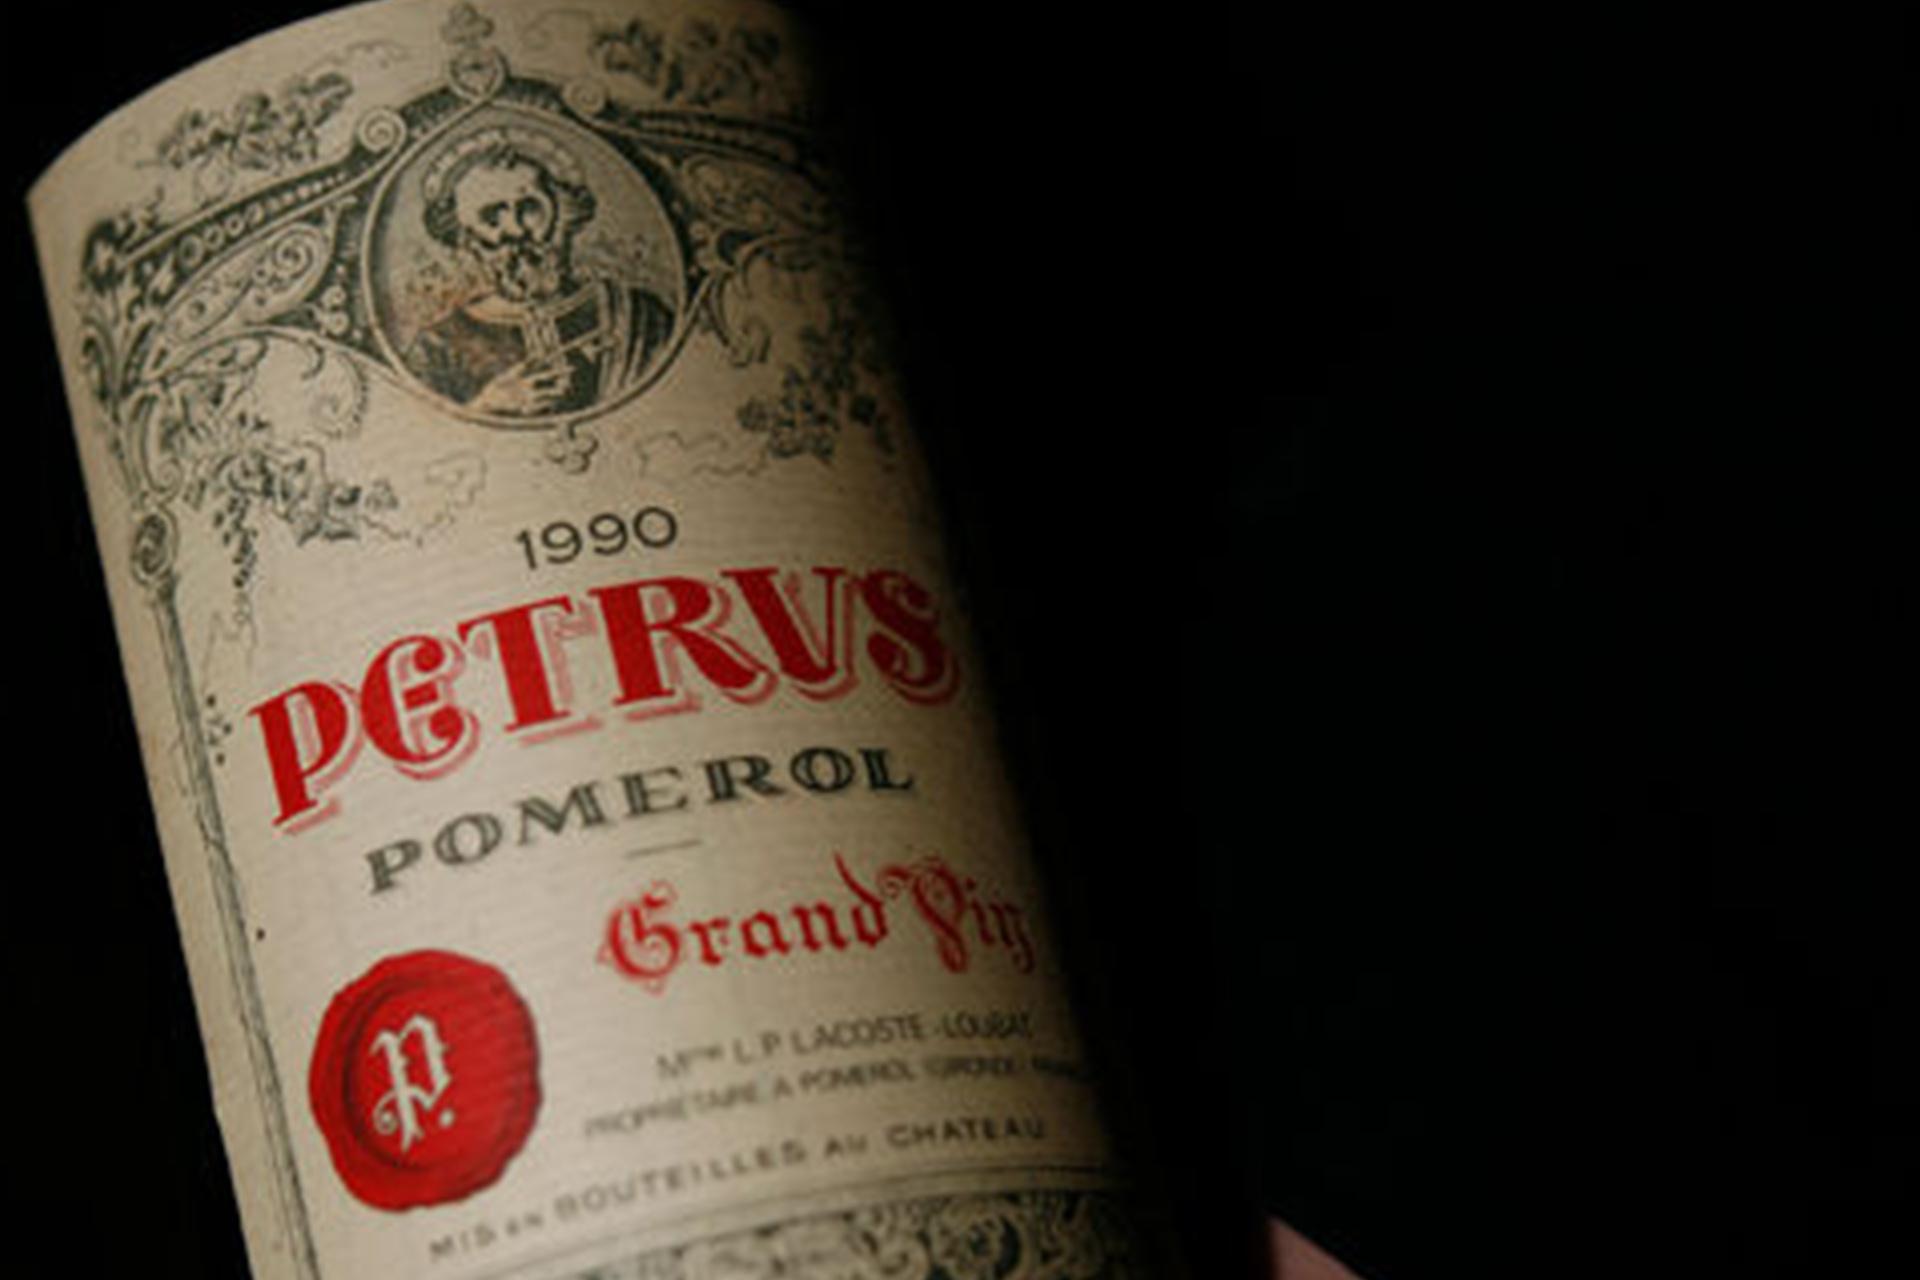 Pétrus - アペロ ワインバー オーガニックワインxフランス家庭料理 - 東京都港区南青山3-4-6 / apéro WINEBAR - vins et petits plats français